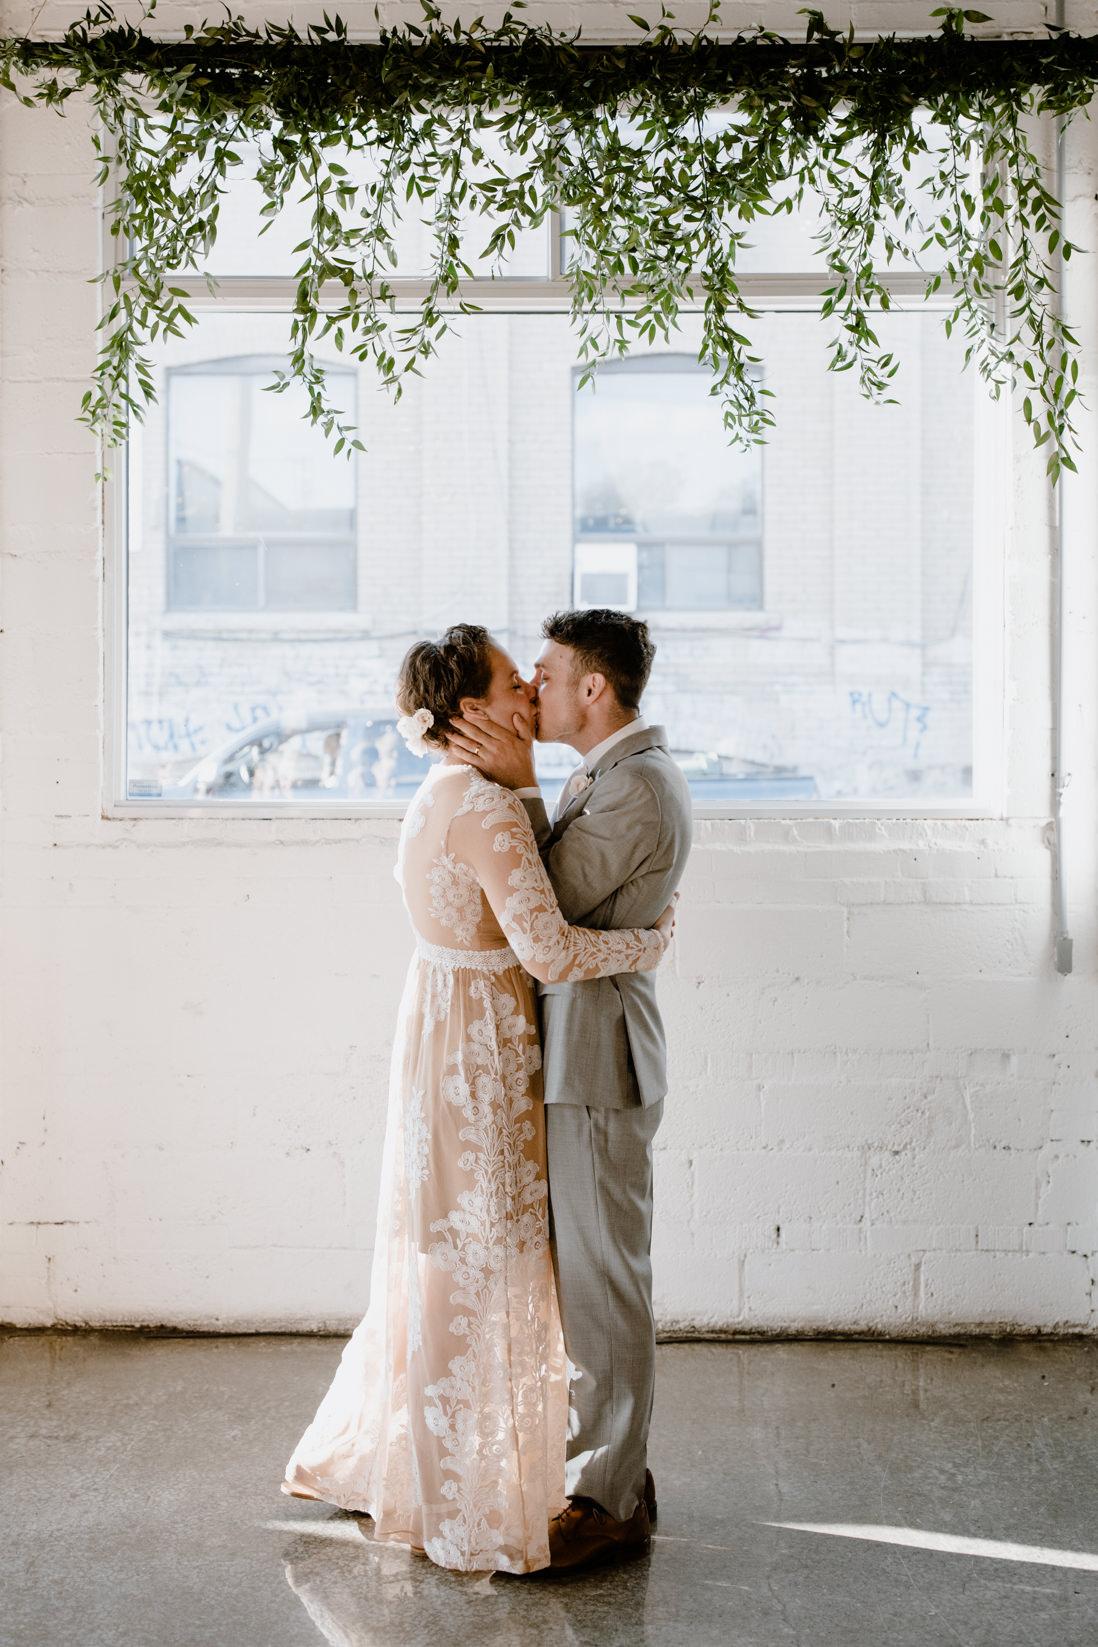 first kiss wedding ceremony Propeller Coffee Co Toronto_EightyFifth Street Photography